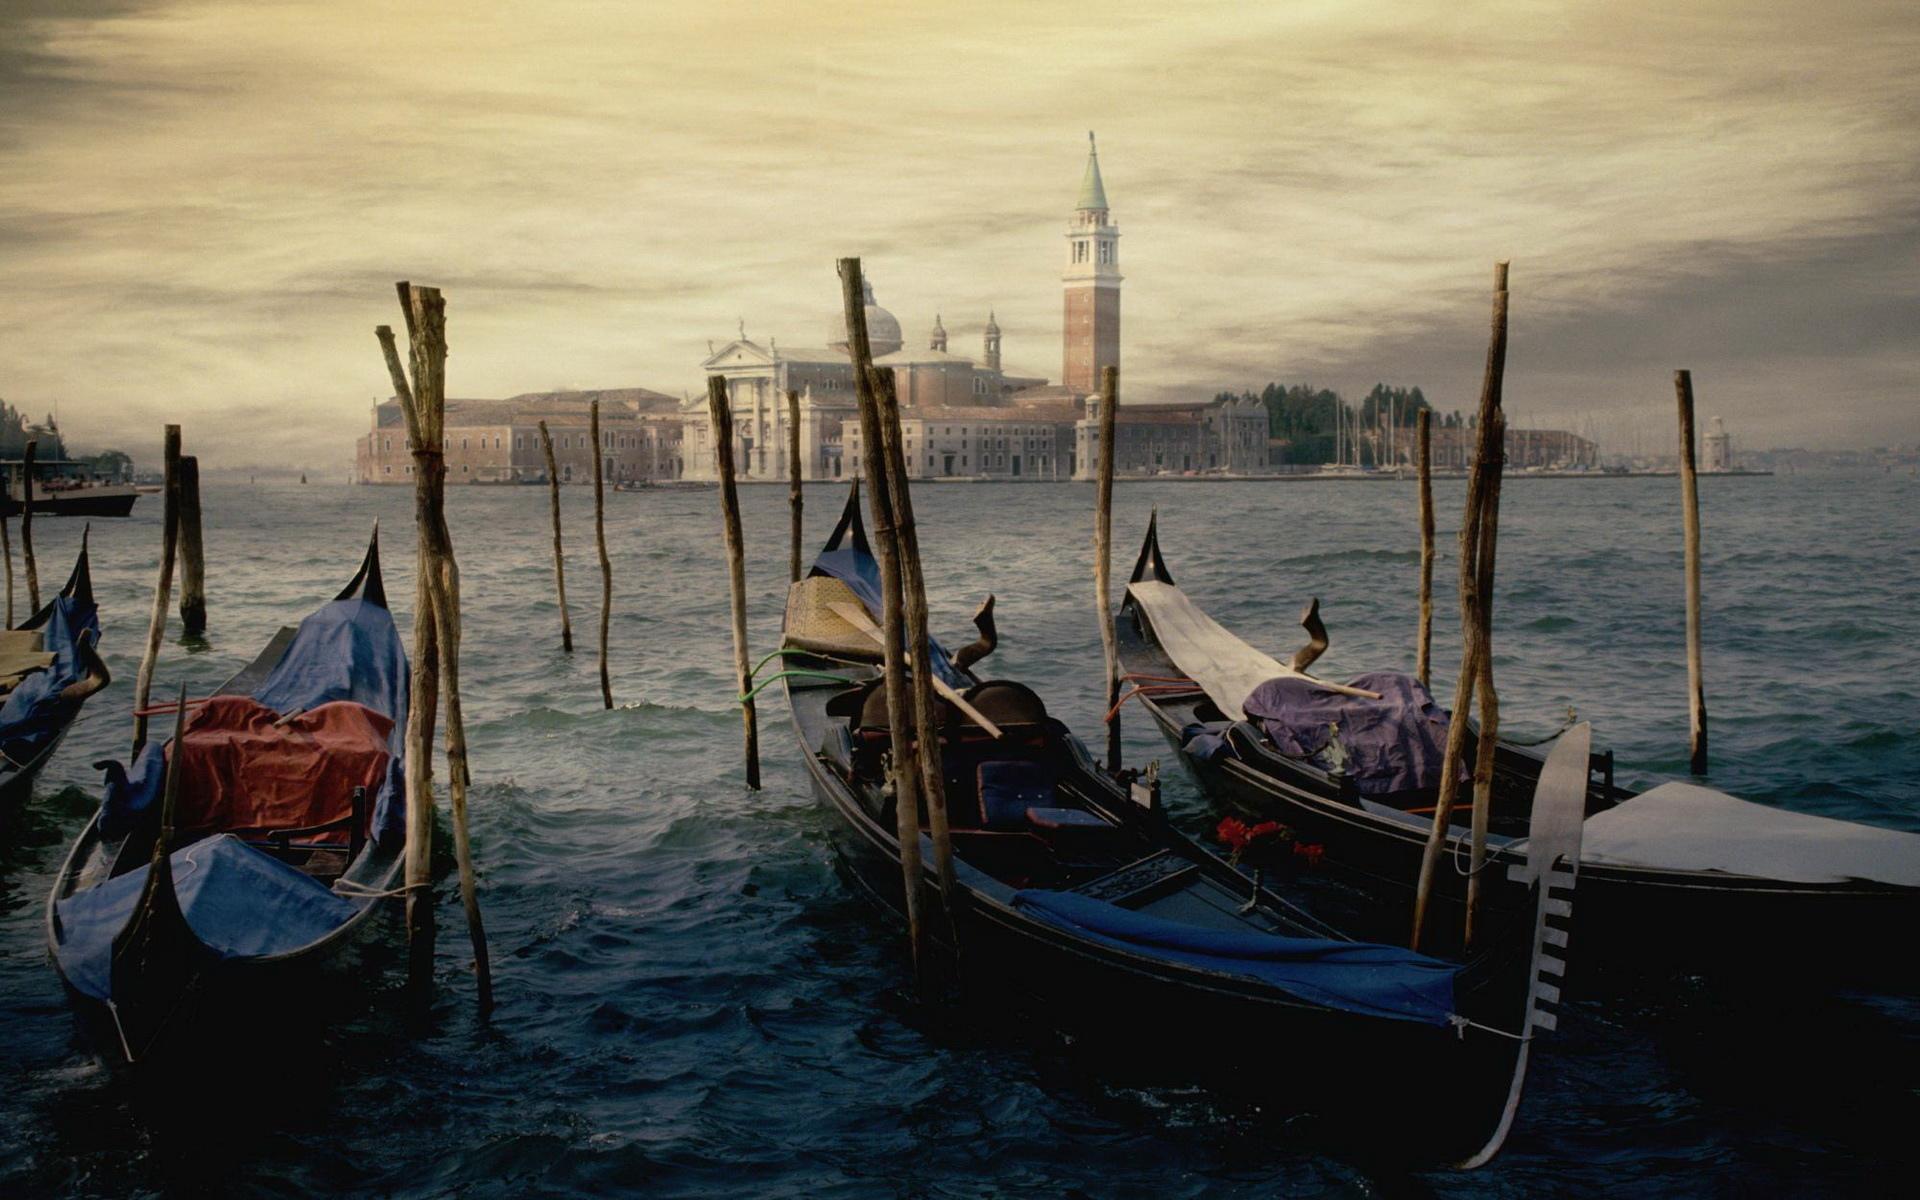 Gondola wallpapers HD quality